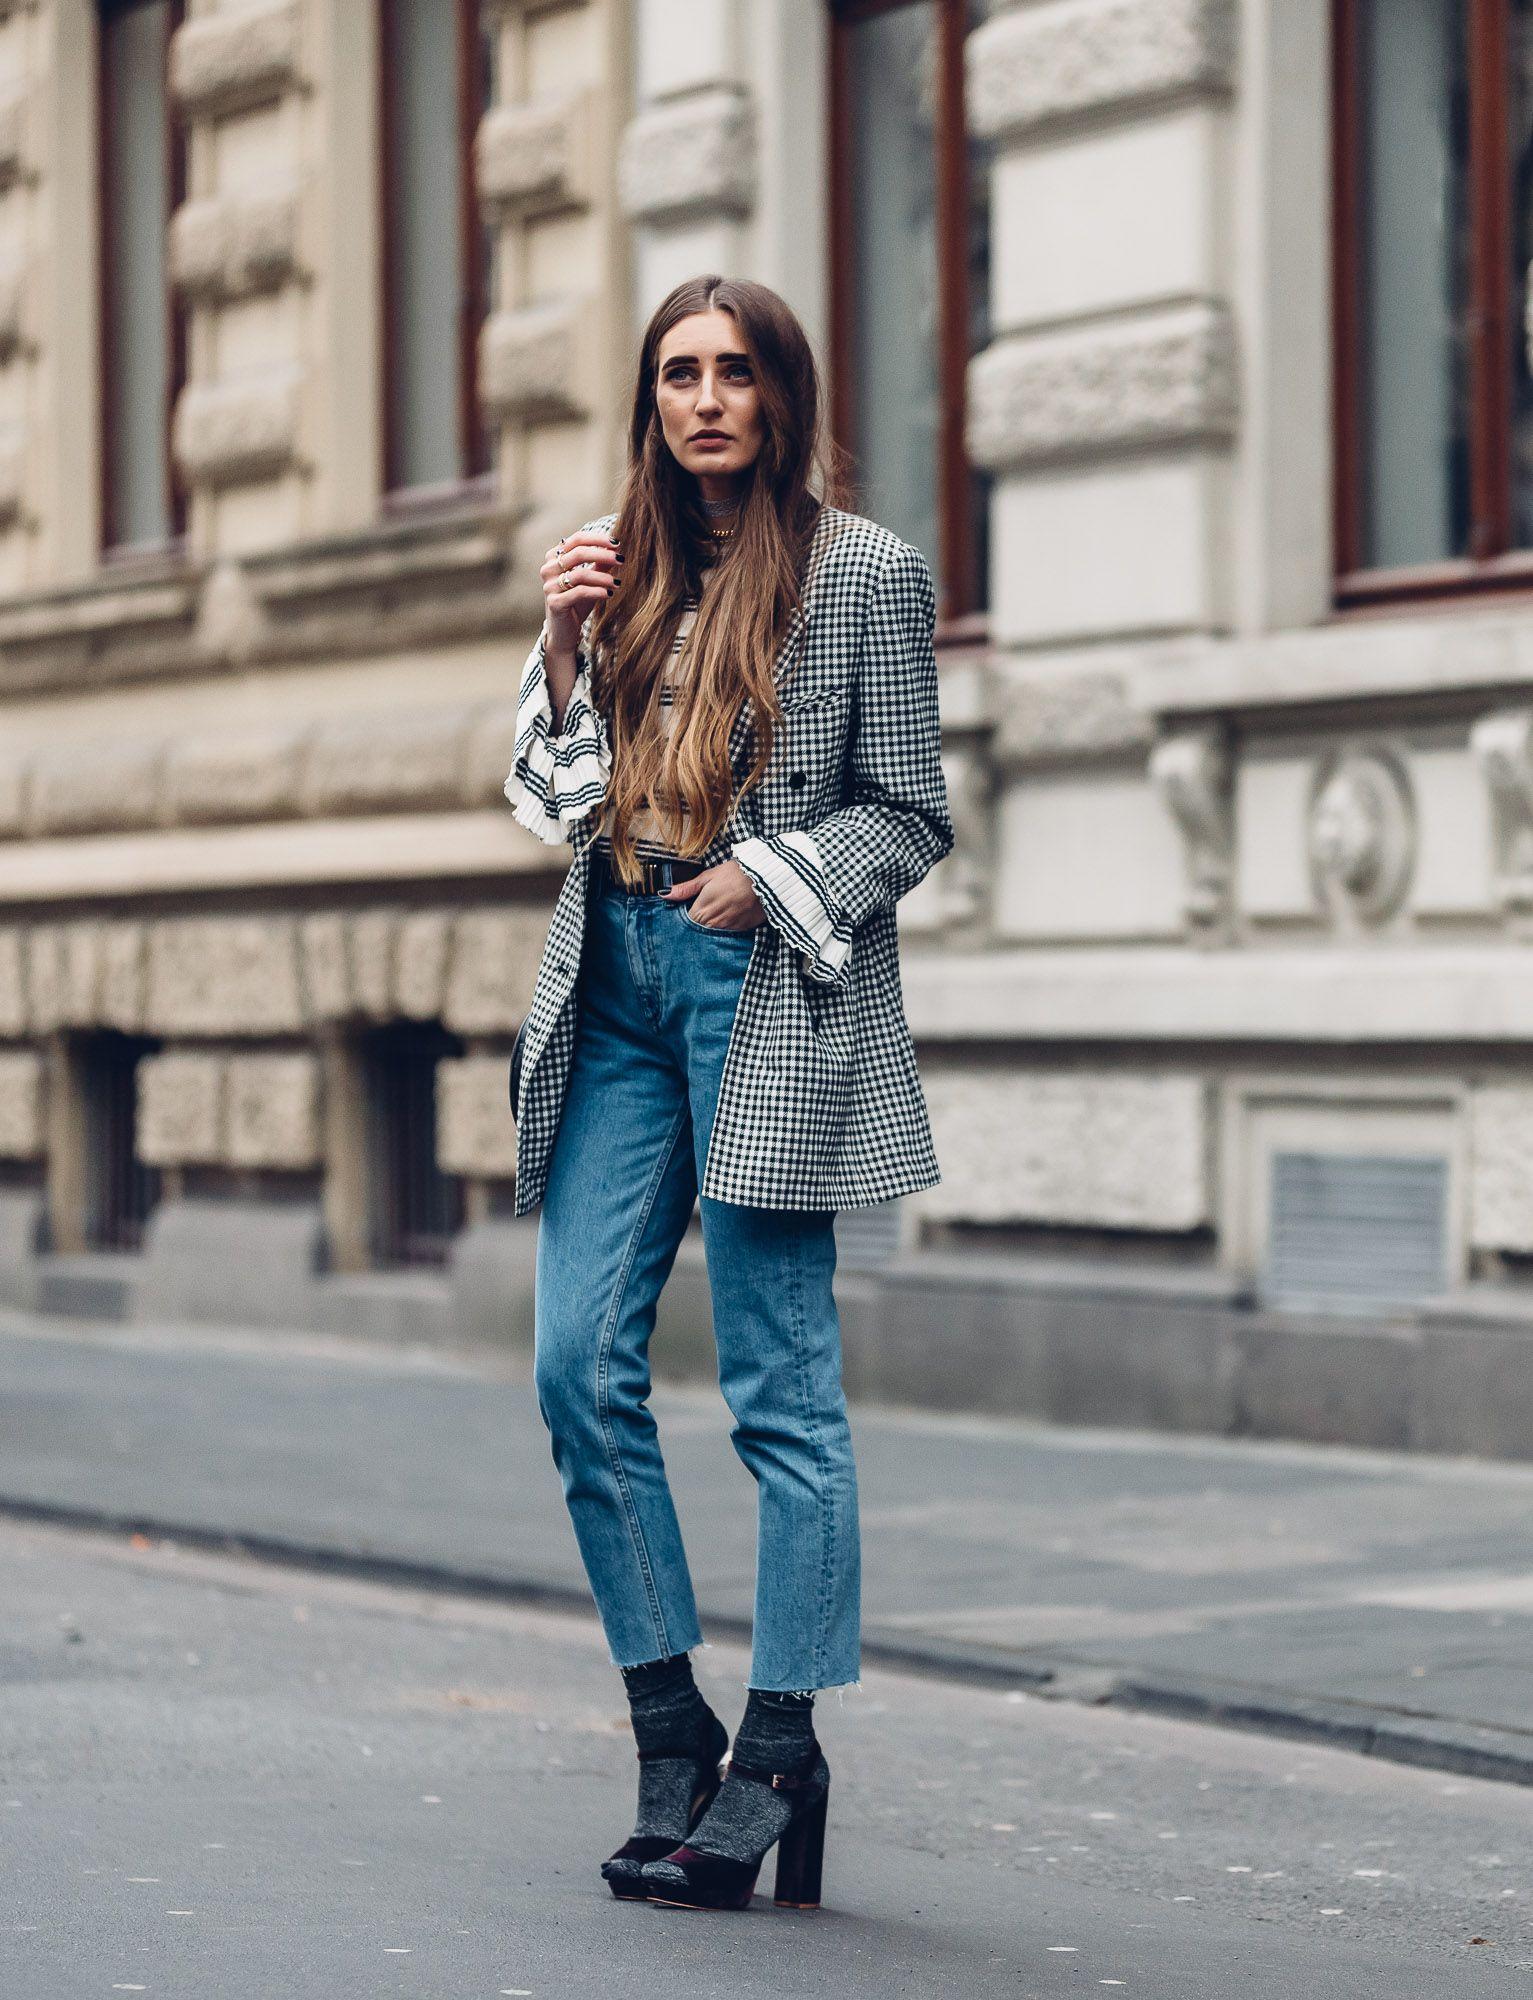 Wearing Buffalo Velvet High Heels & Glitter Socks, Vintage Blazer and High Waisted Denim | INSTA @thelfashion